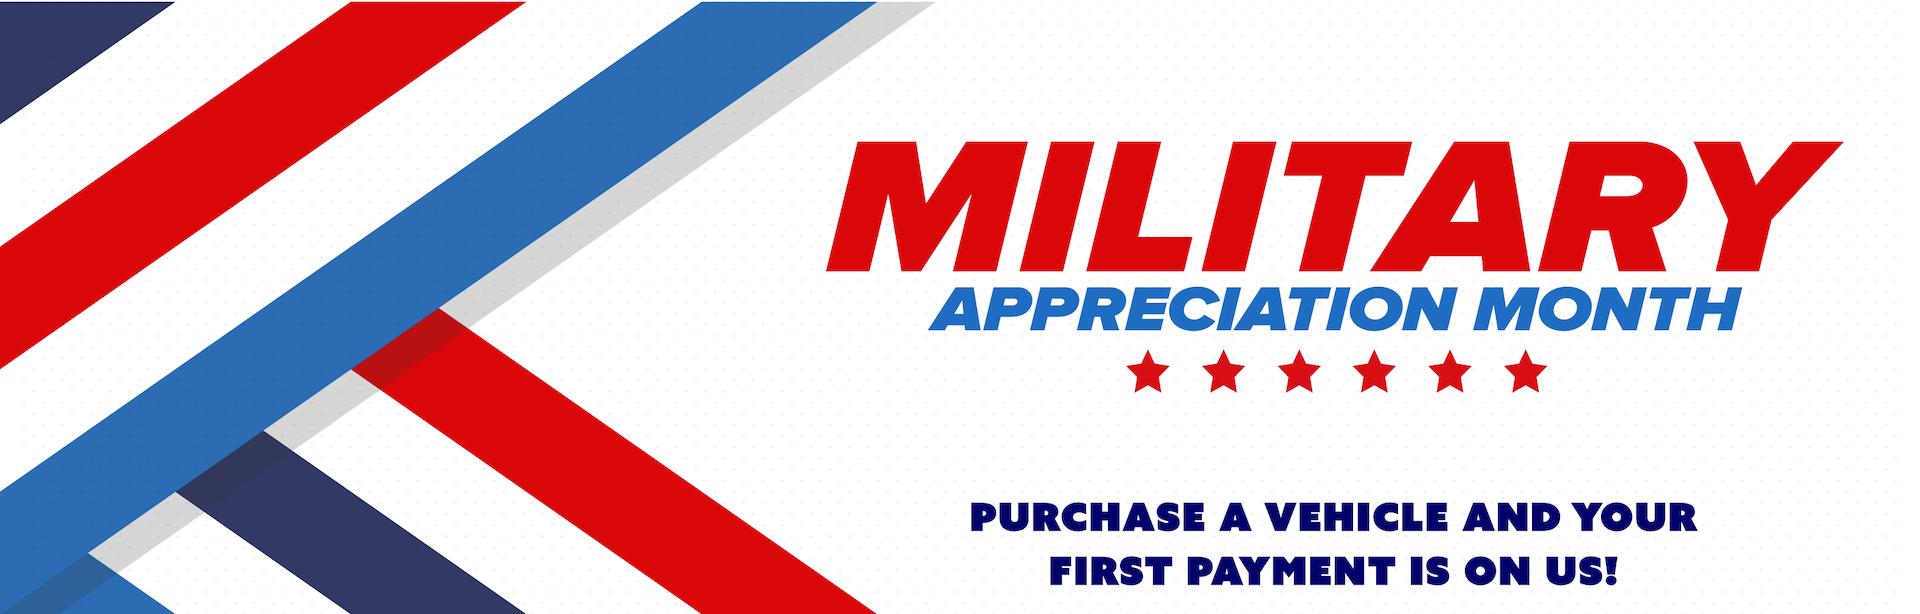 Military Appreciation Web banner